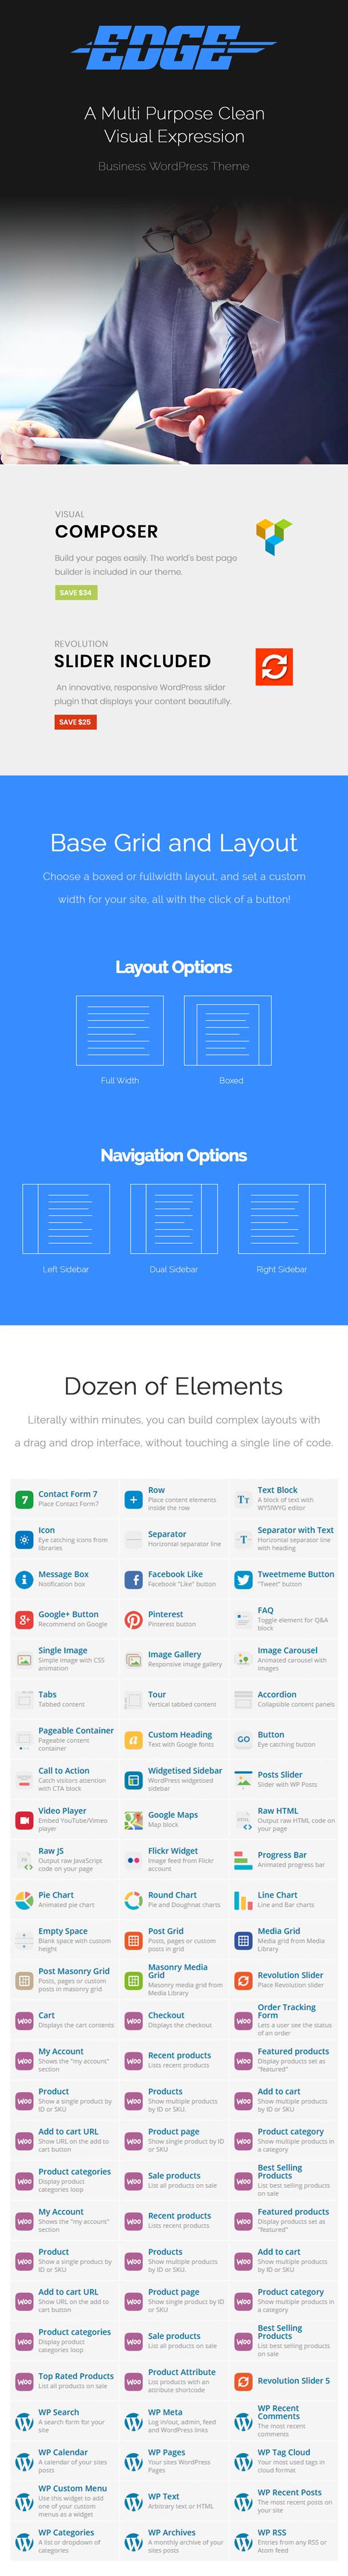 edge-presentation.jpg